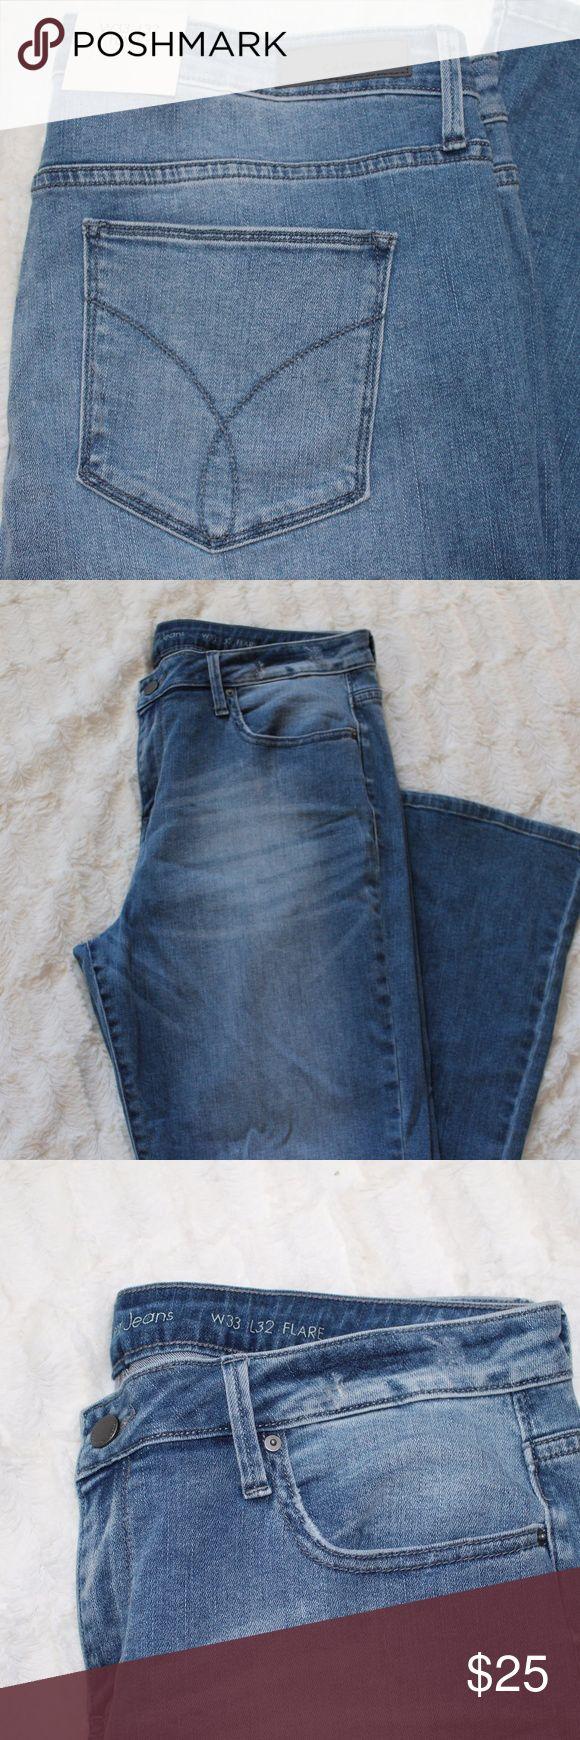 "NWT-Calvin-Klein-Light-Wash-Flare-Denim-Jeans Brand new light wash flare jeans by Calvin Klein. Lightly factory distressed jeans.  Brand: Calvin Klein Size: W33 L32 Measurements: Waist- 33"", Length- 32"" Calvin Klein Jeans"